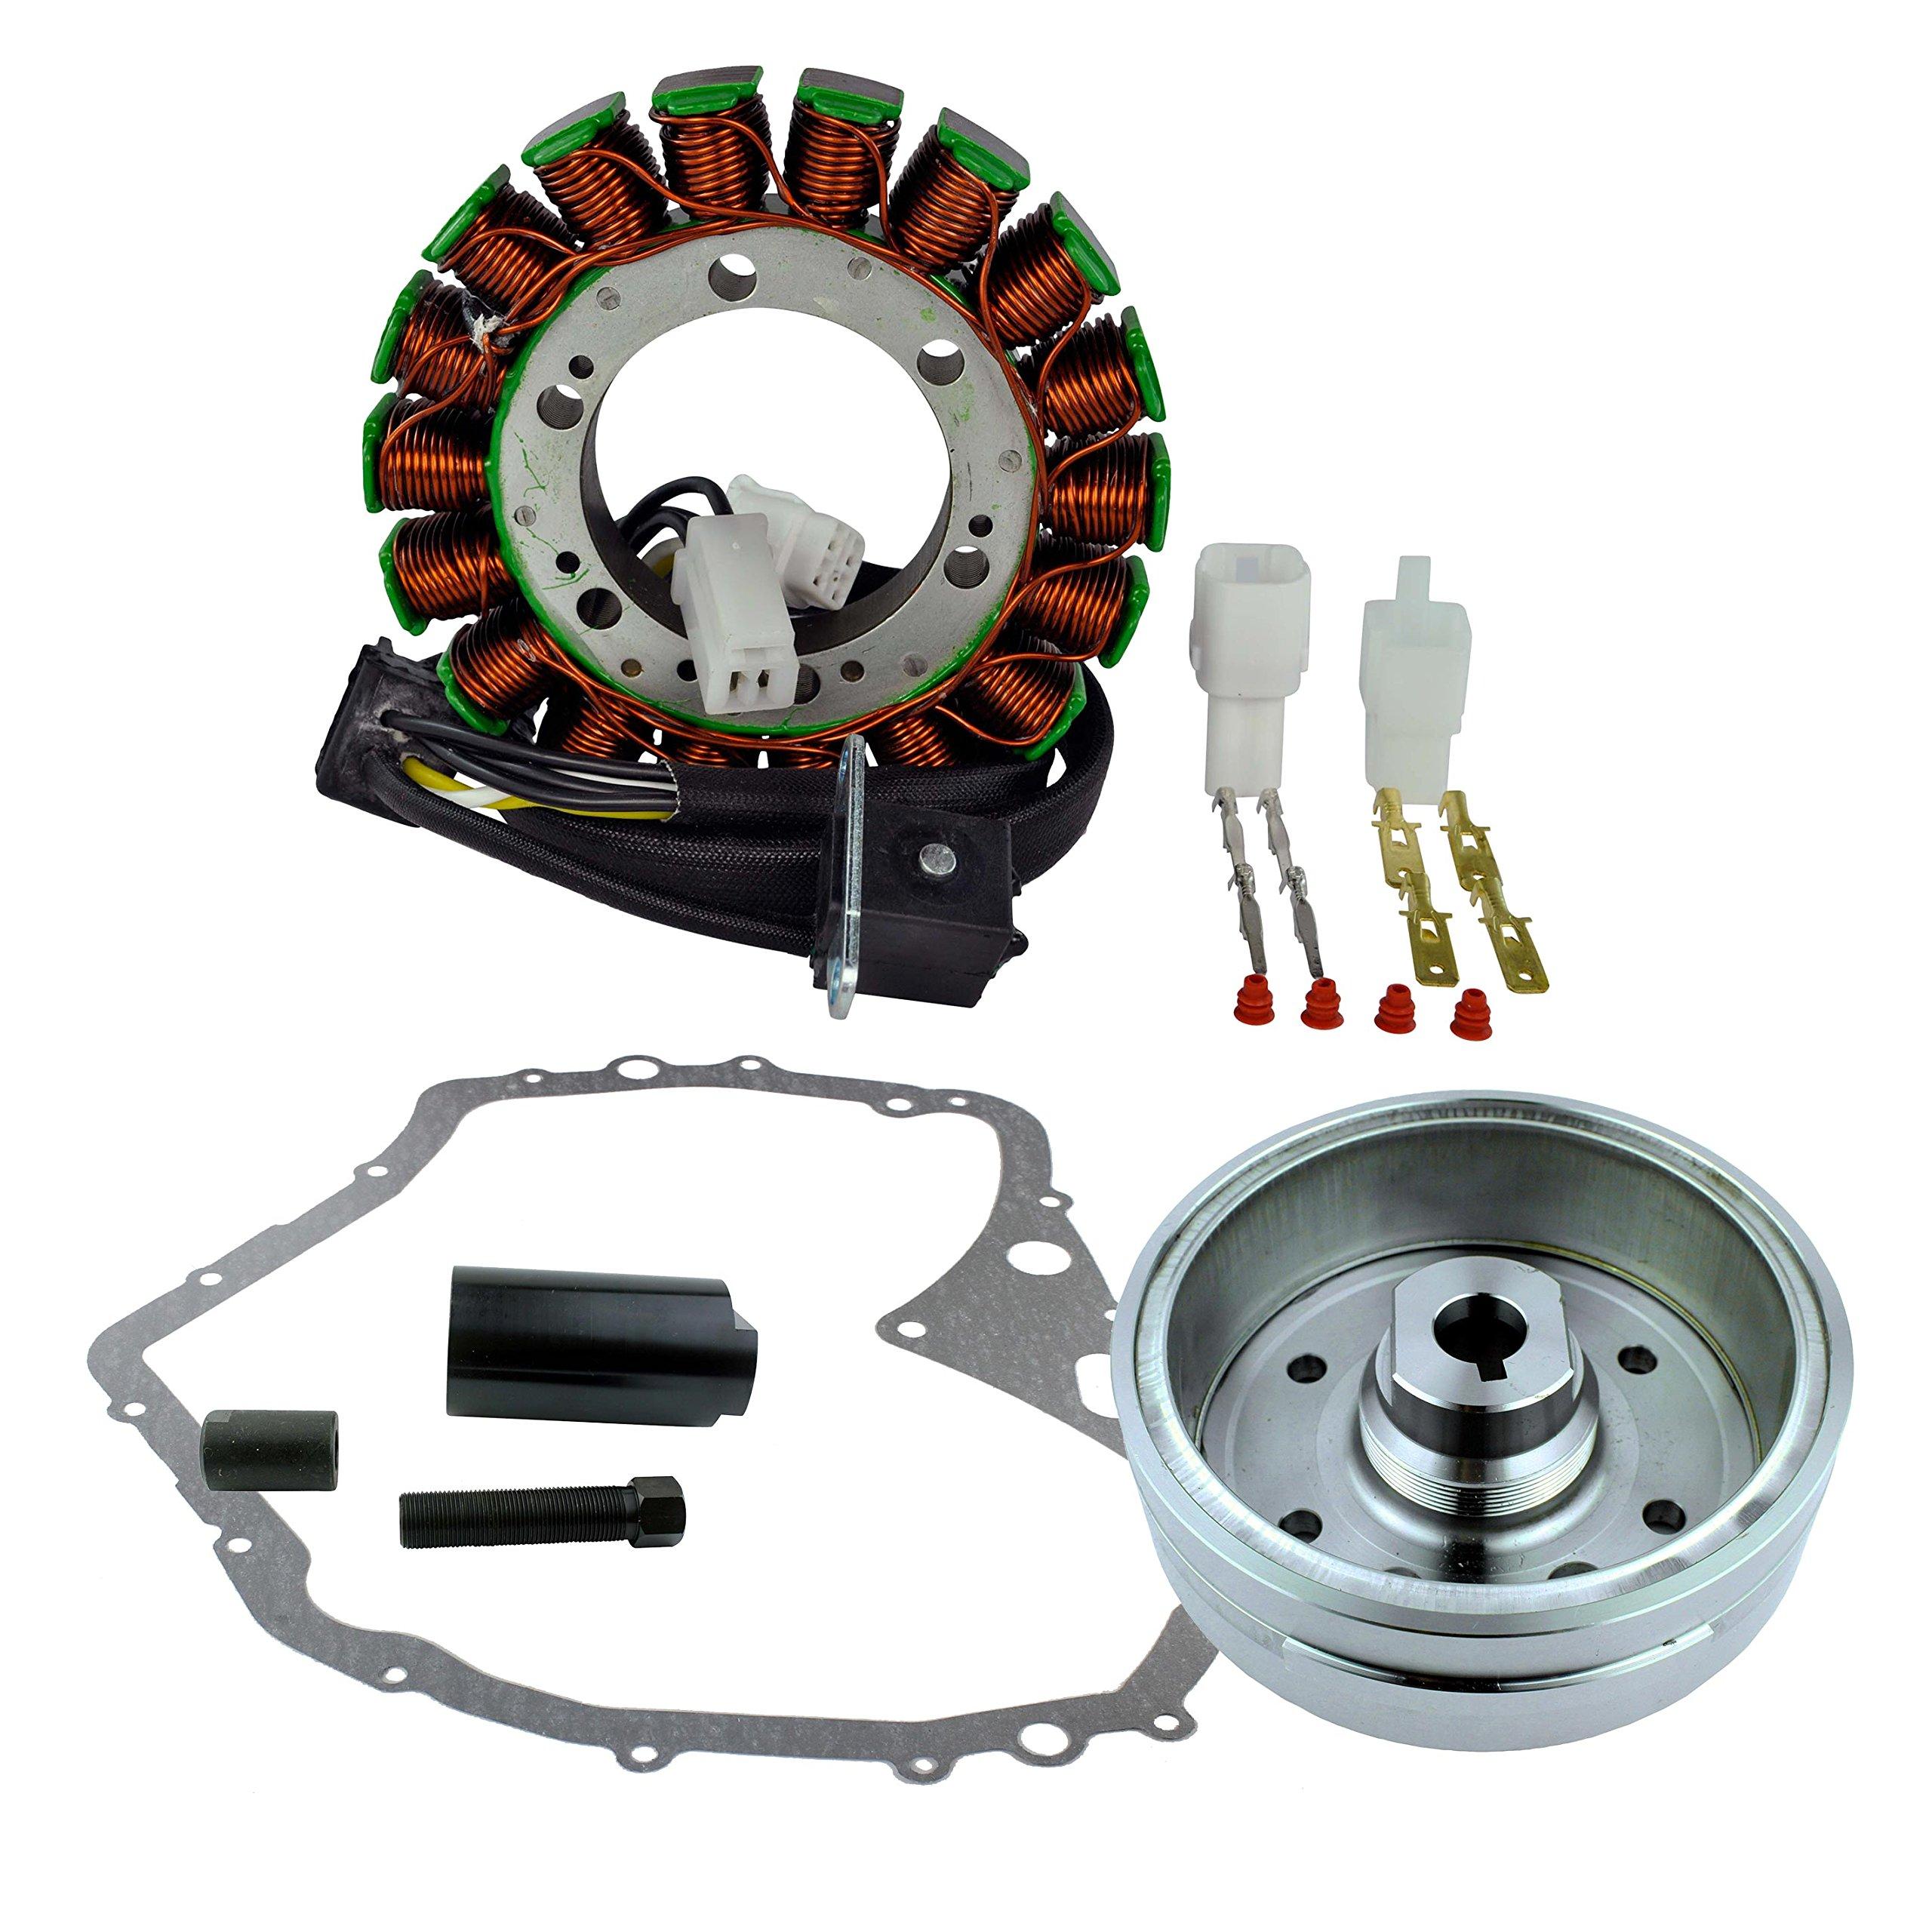 Kit Improved Flywheel + Flywheel Puller + Stator + Crankcase Cover Gasket For Arctic Cat 400 Manual 2003-2008 / Suzuki LTF 400 Eiger 2002-2007